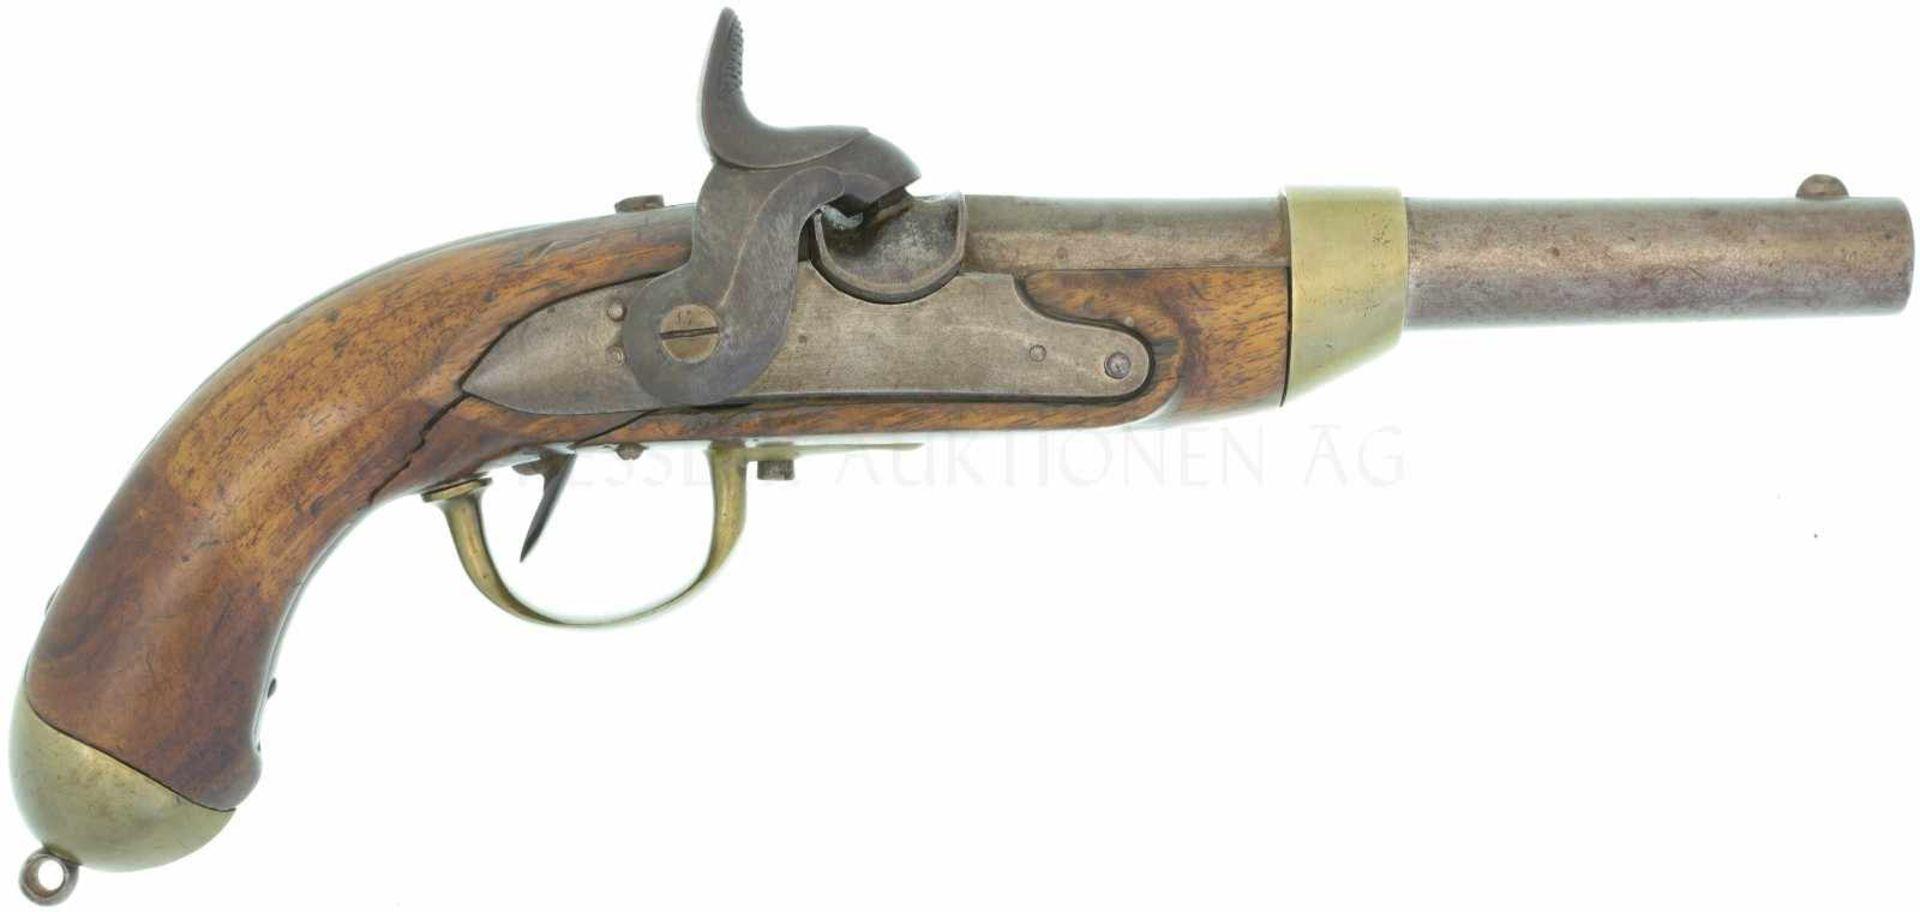 Perkussionspistole, Mod. 1817/42, Kt. AG, Kal. 17.6mm